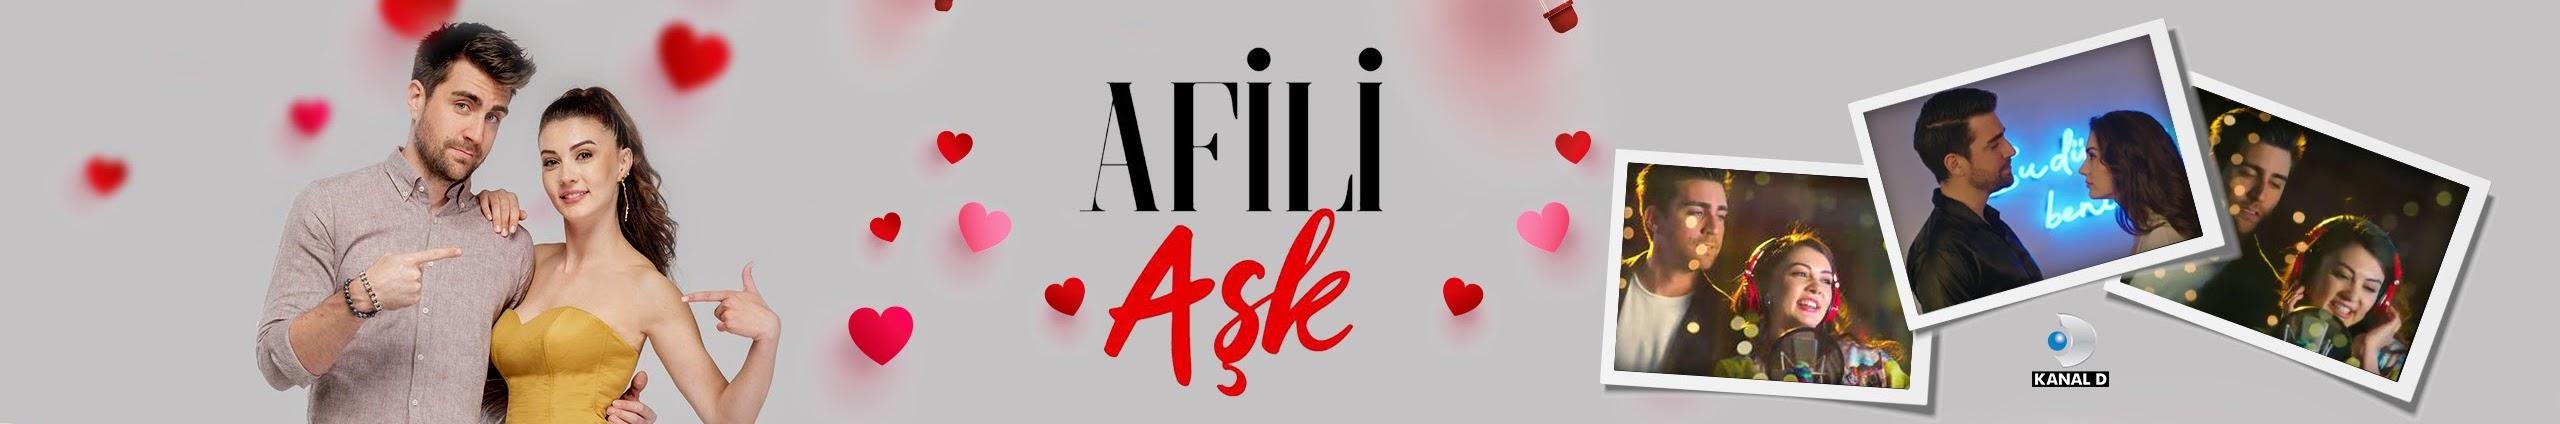 Turkish series Afili Ask english subtitles - TurkFans com